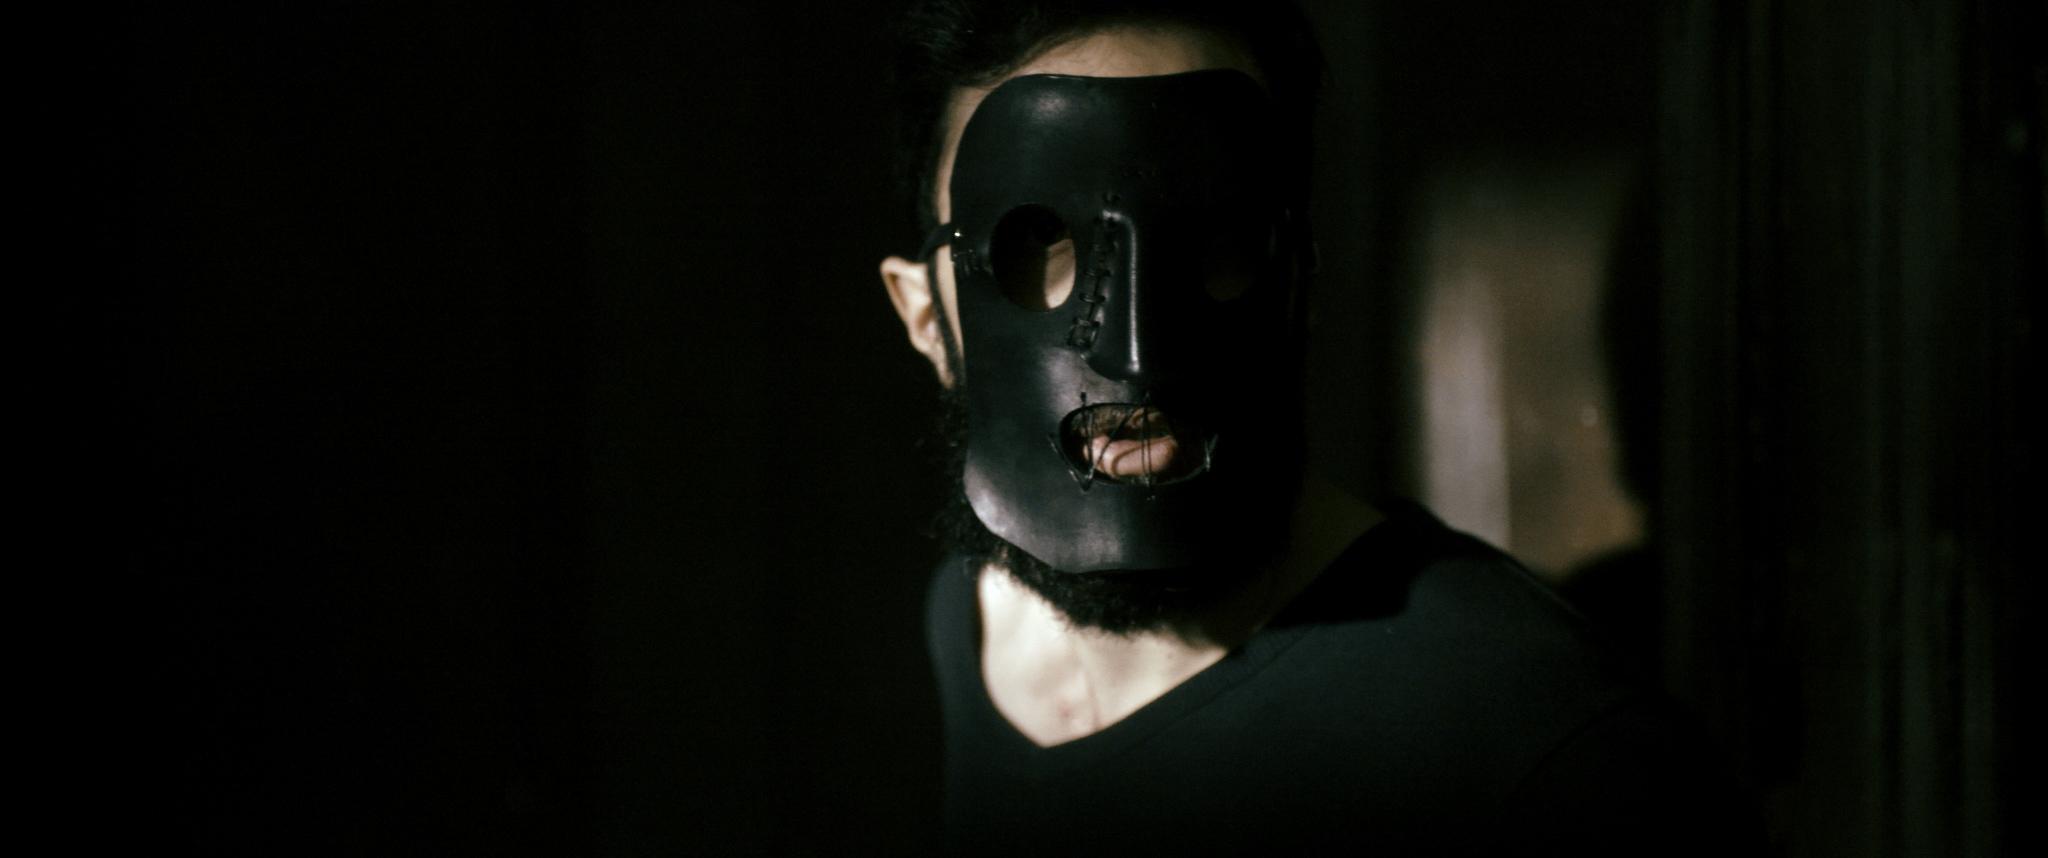 Secretions_medium_close-up_Tattooed_Man.jpg